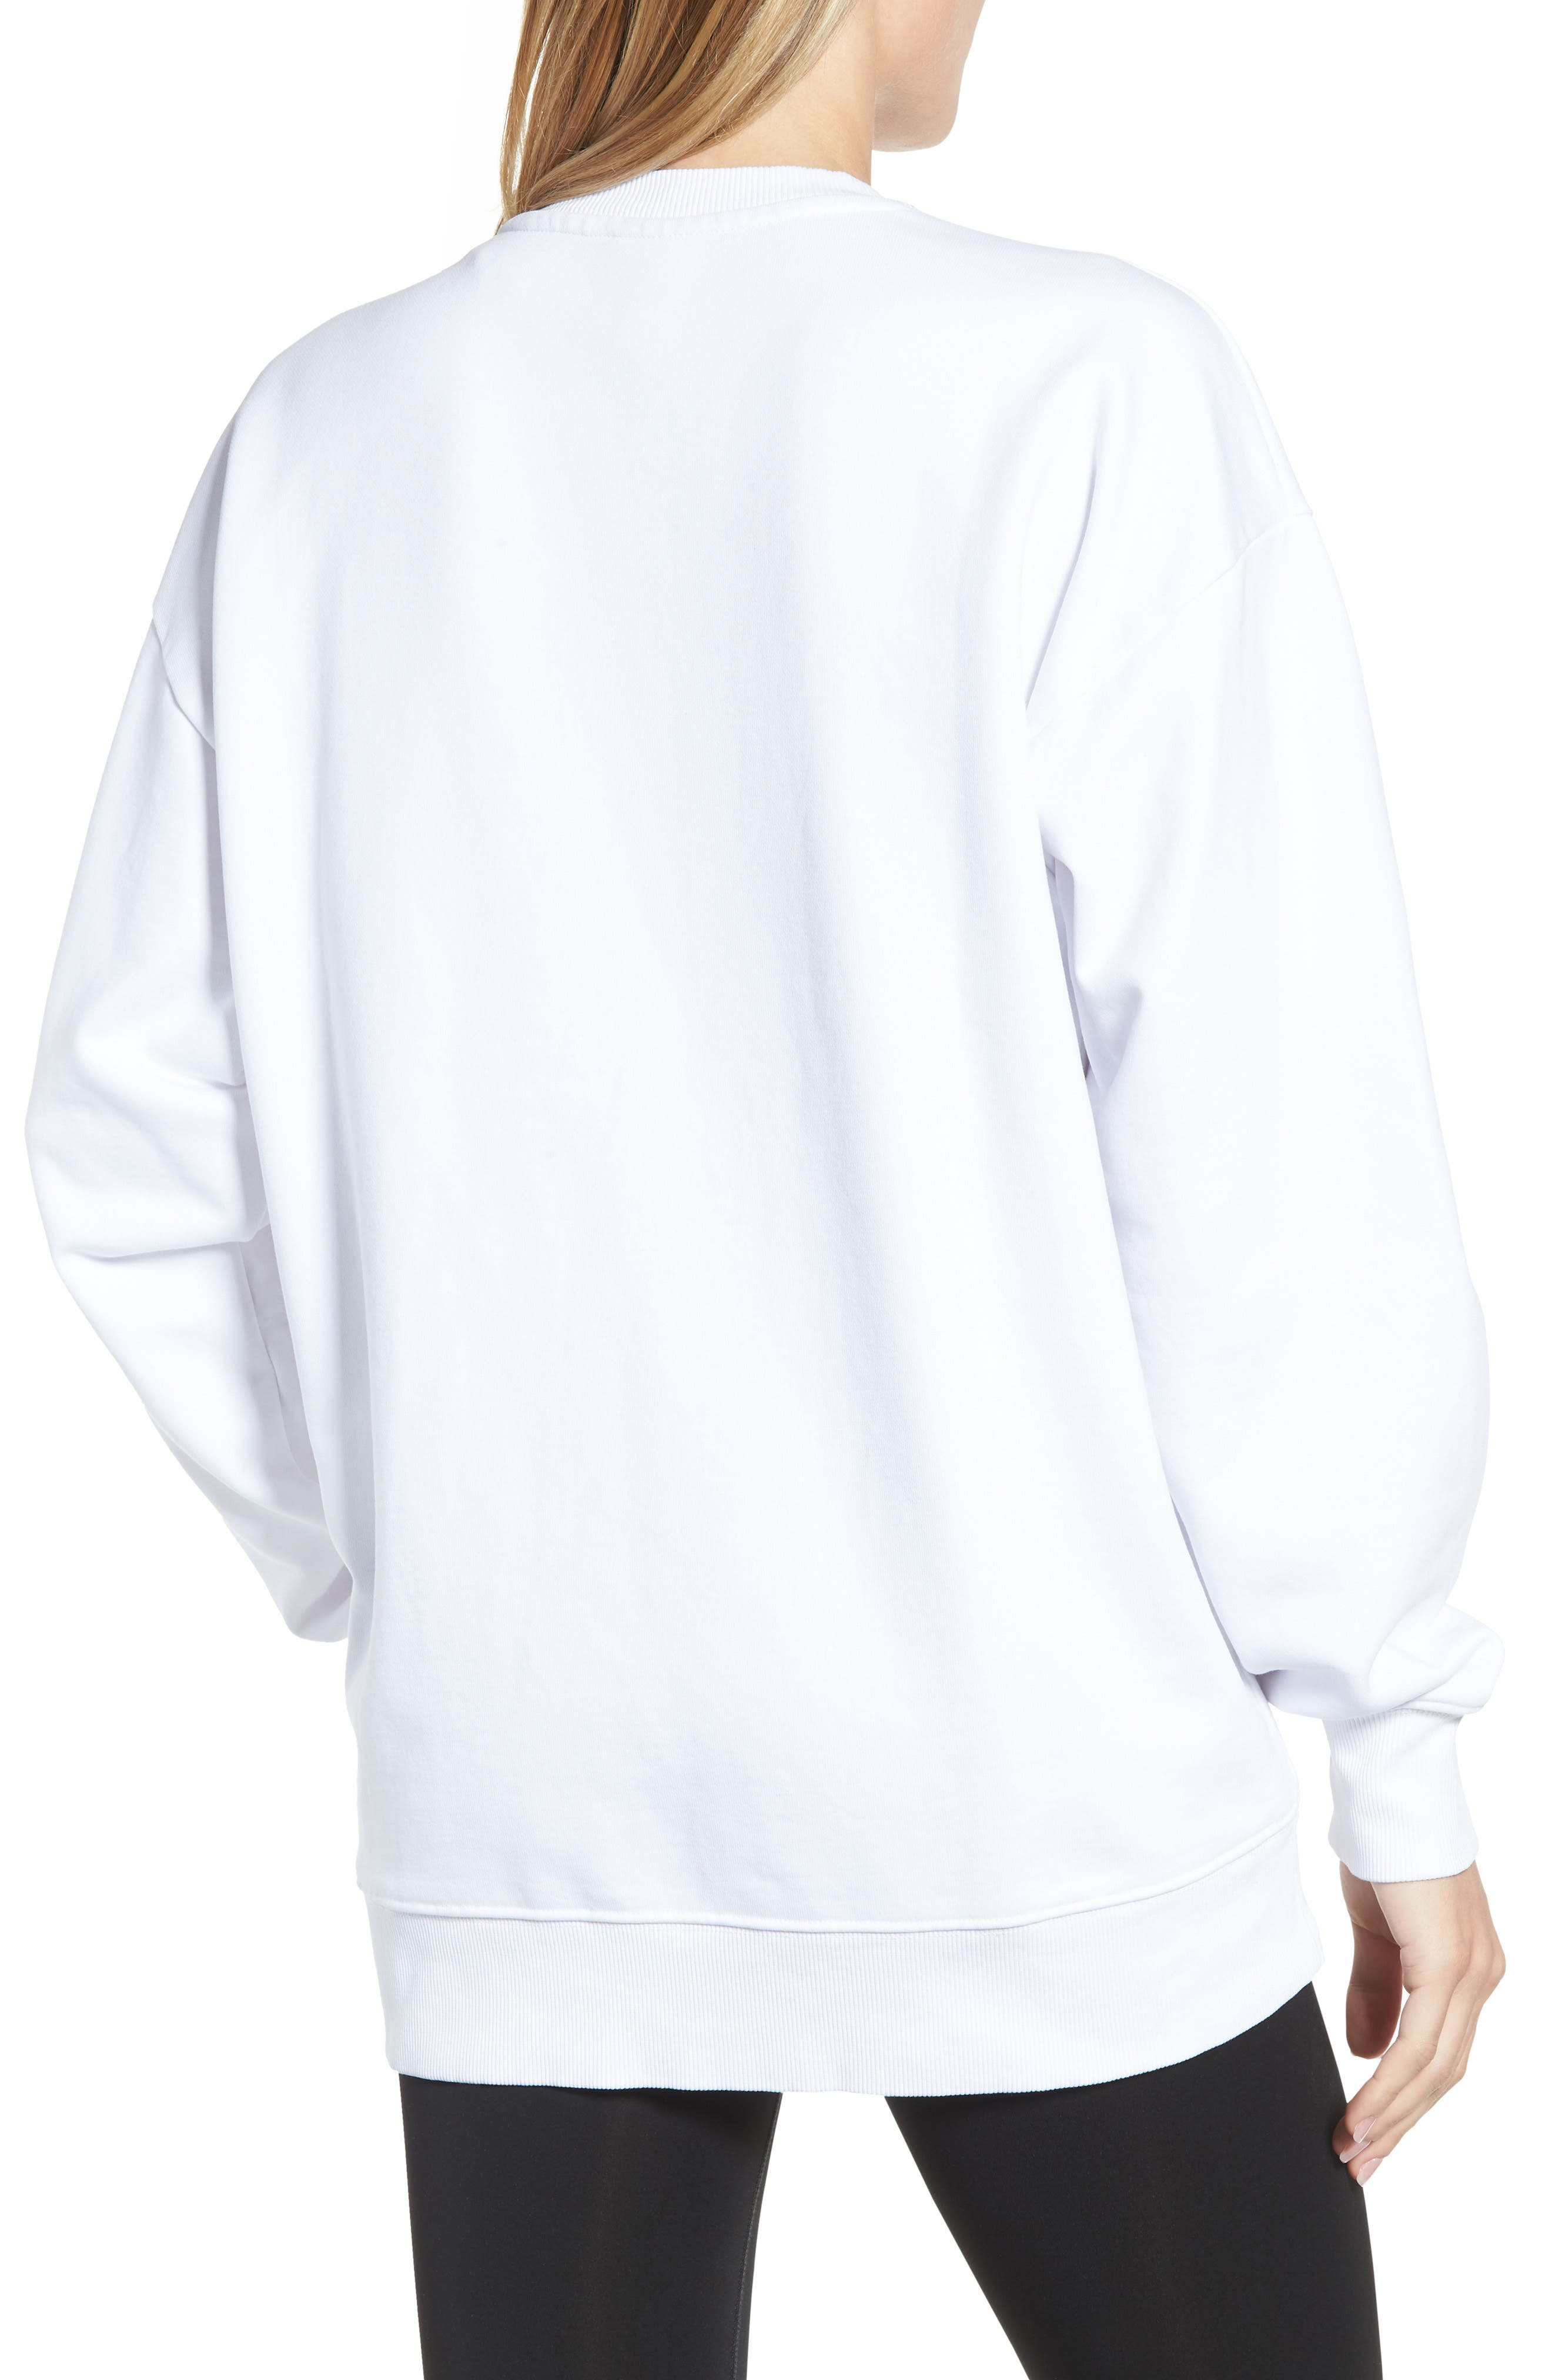 Flag Badge Sweatshirt,                             Alternate thumbnail 2, color,                             White